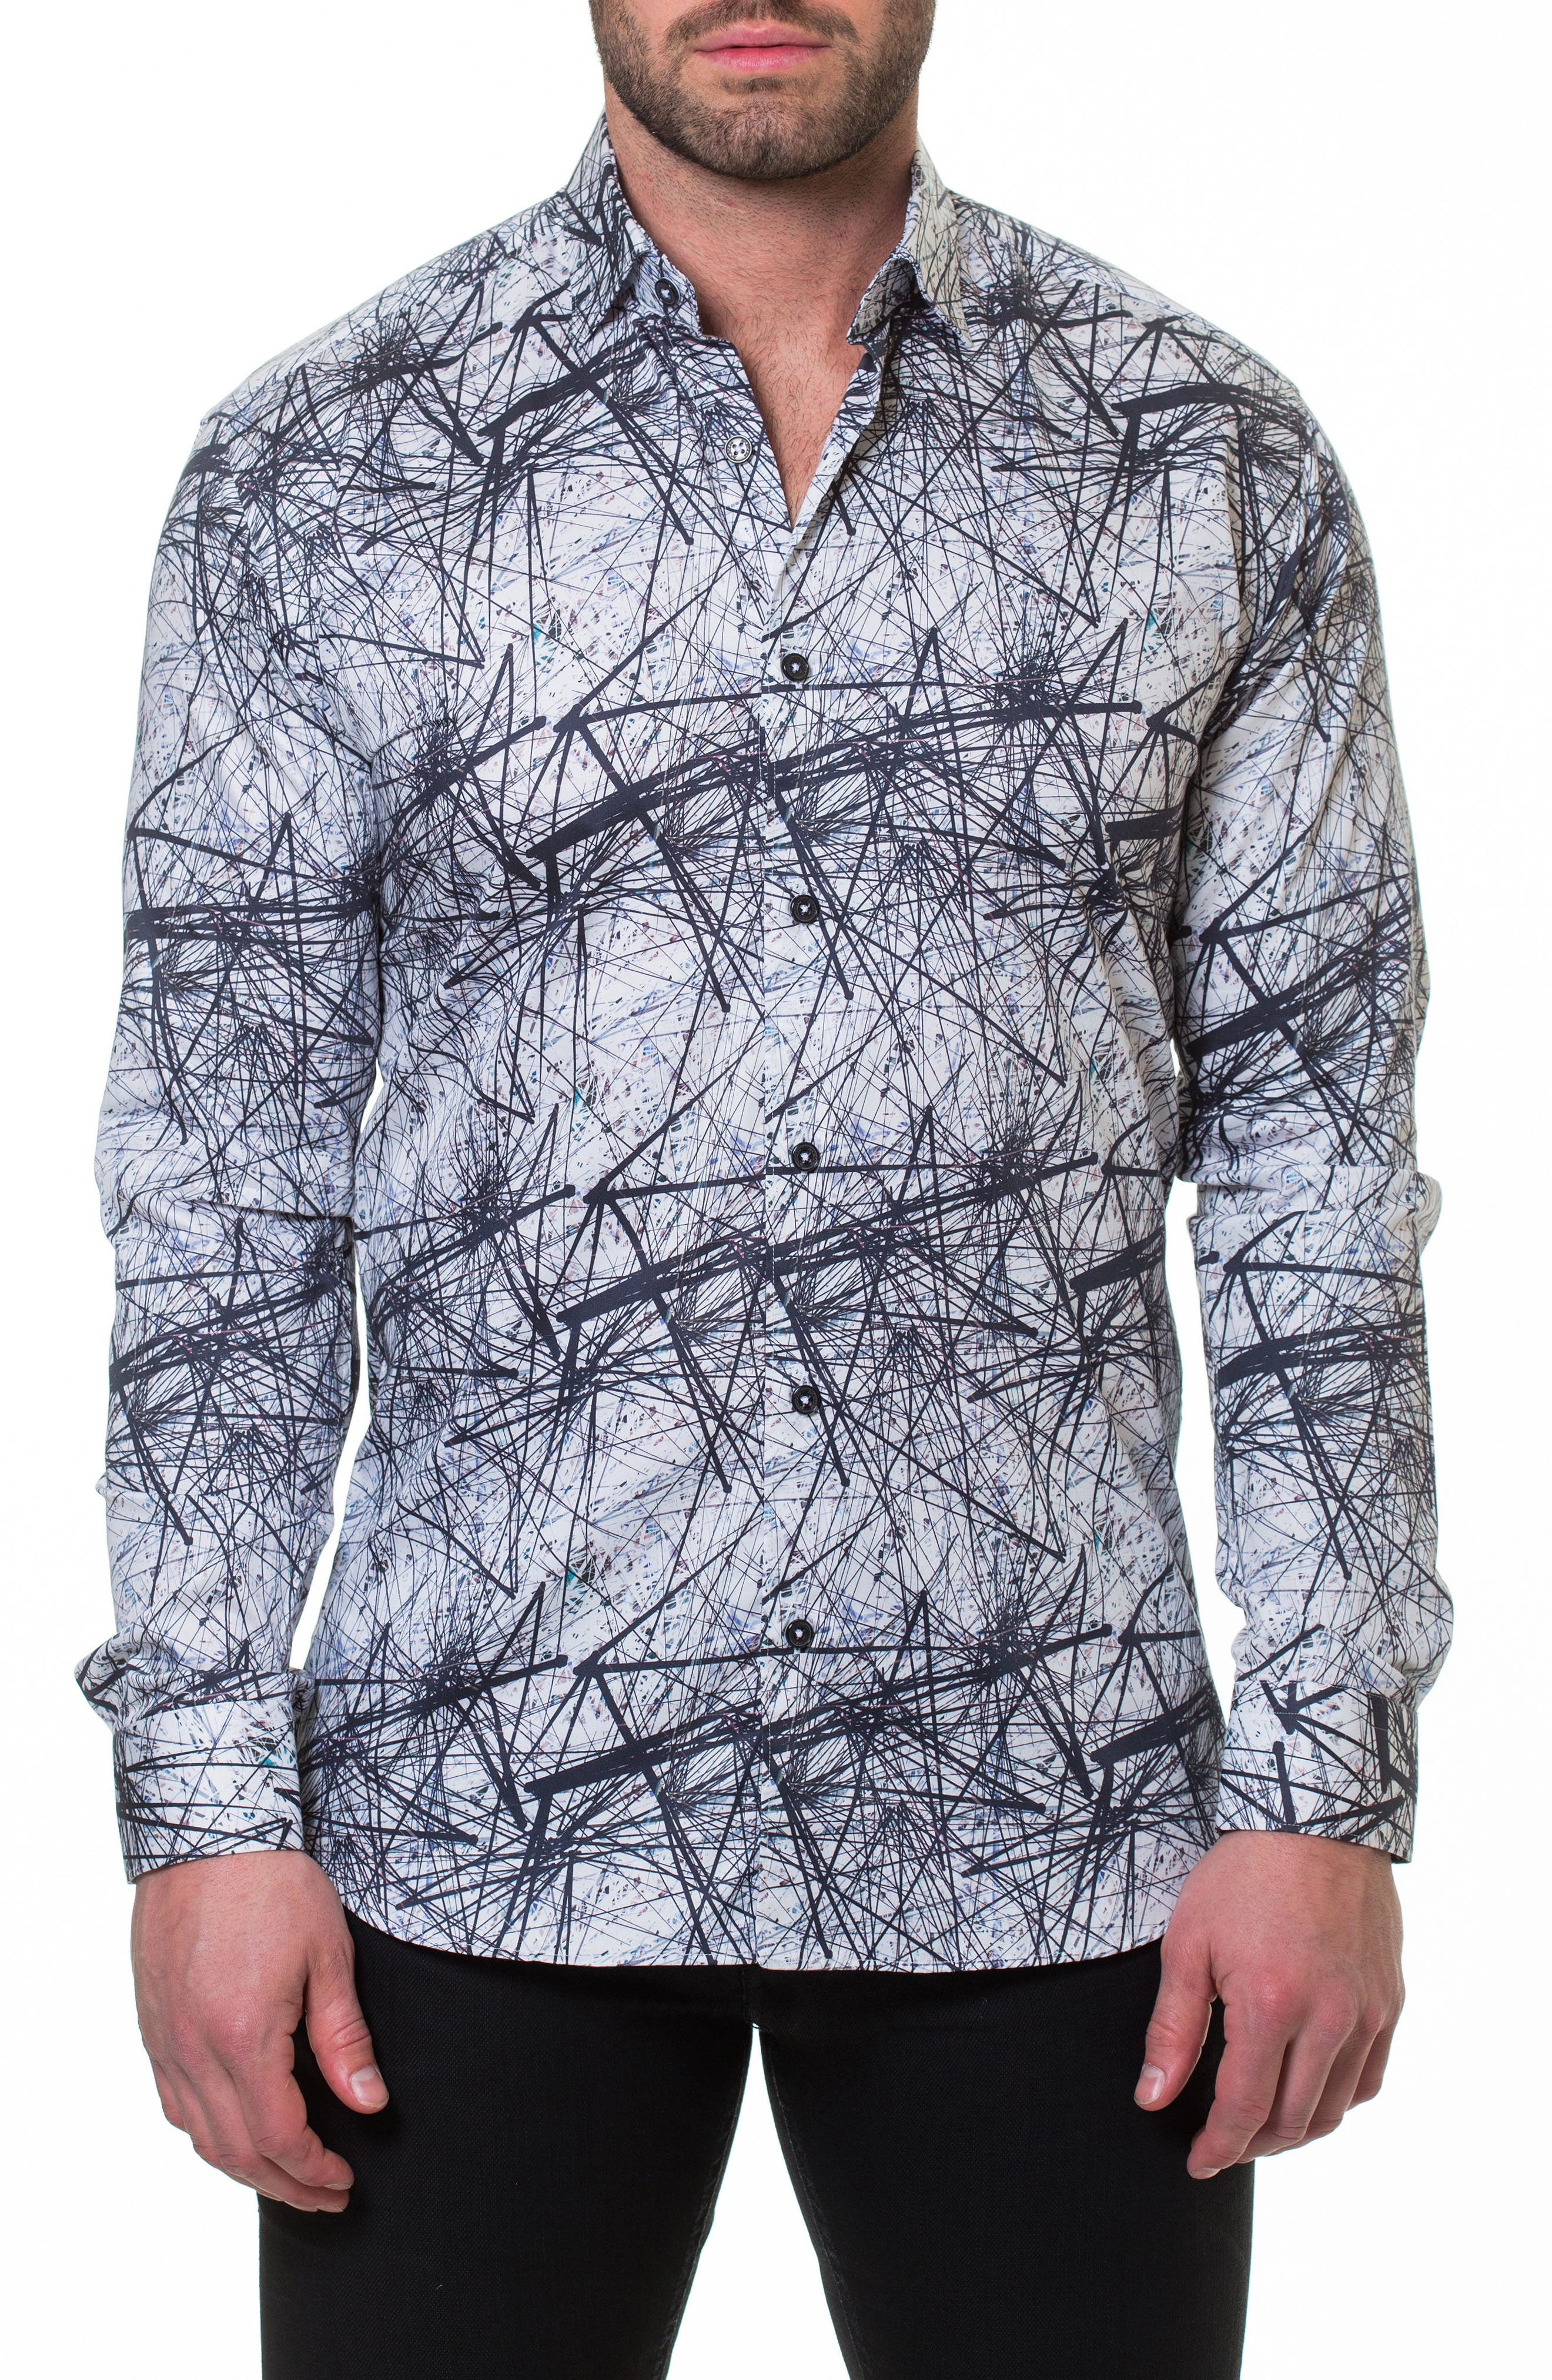 Maceoo Luxor Nerve Sport Shirt